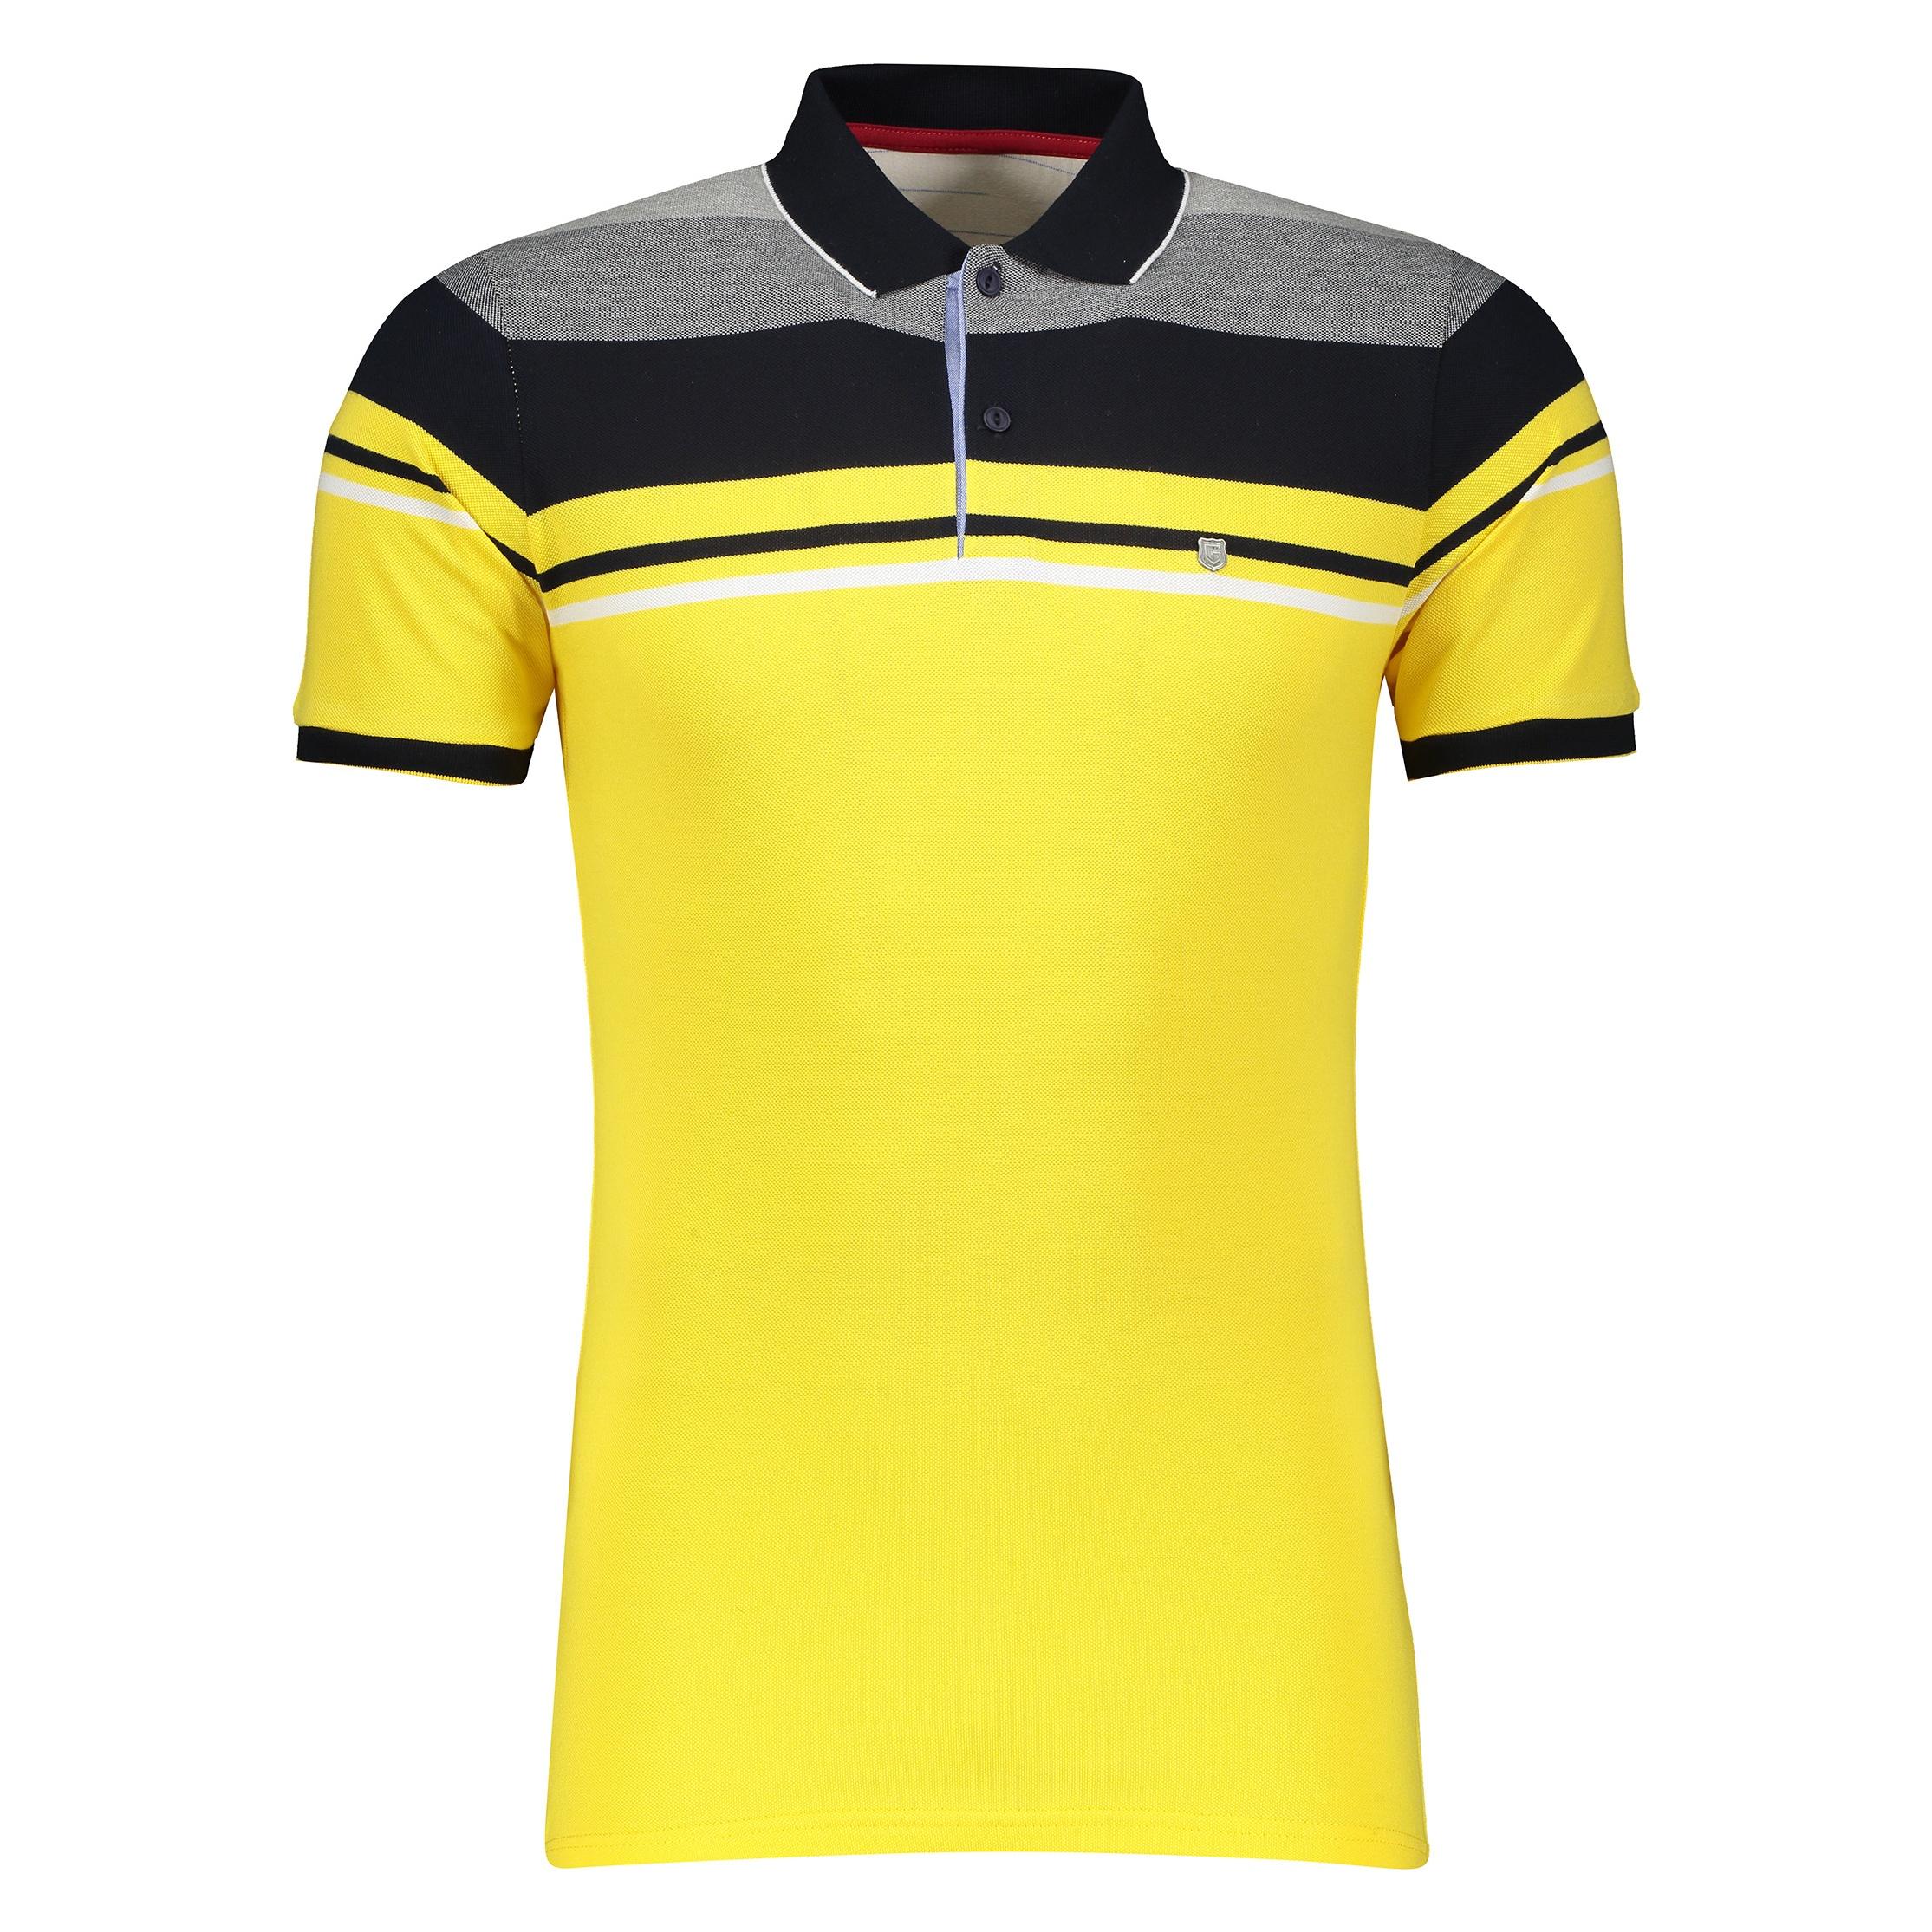 پولو شرت مردانه مدل GDA06